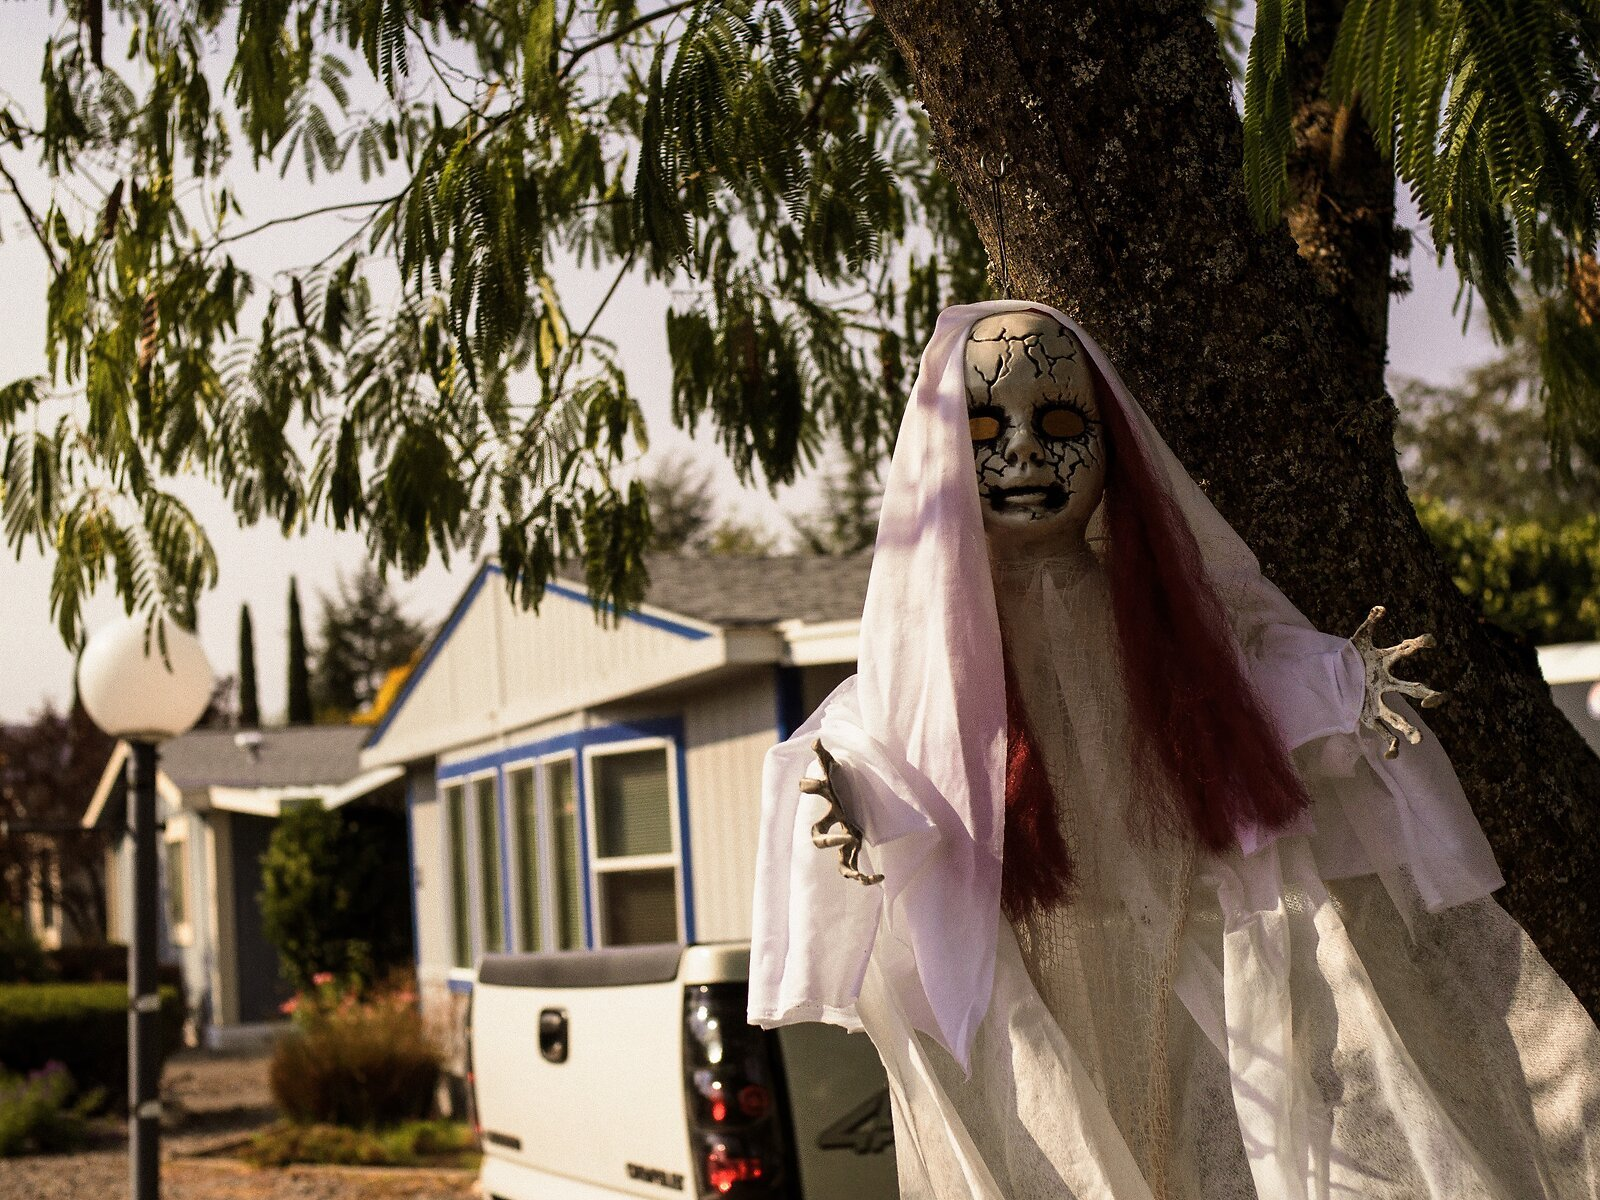 EP3_Oct2_ZombieHalloweenBride(KodachrMem).jpg